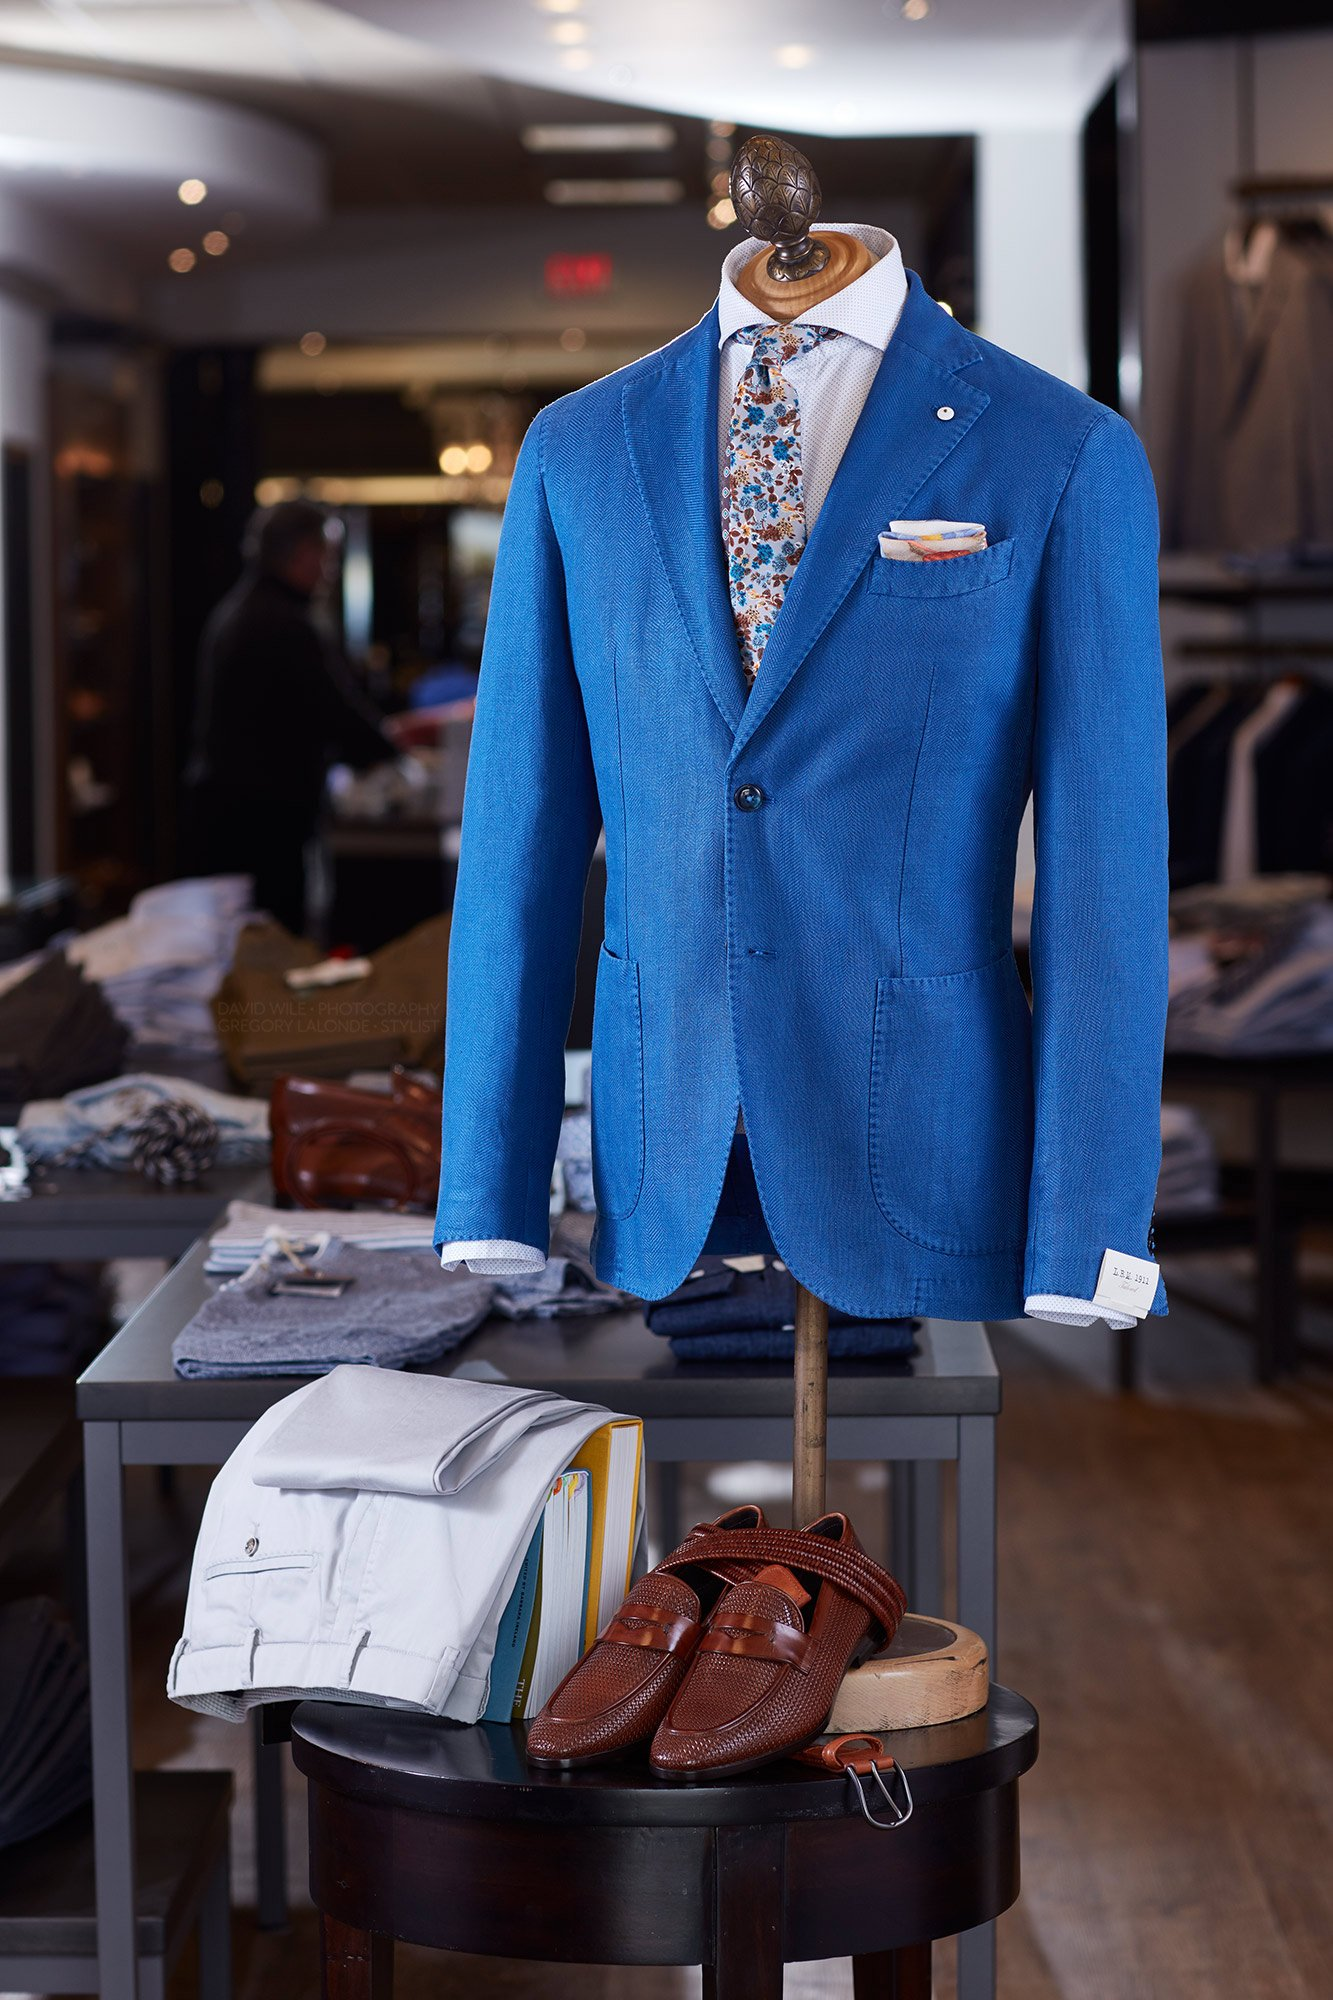 LBM 1911 LUBIAM Luigi Bianchi Canali Loafers Eton Shirt LALONDEs